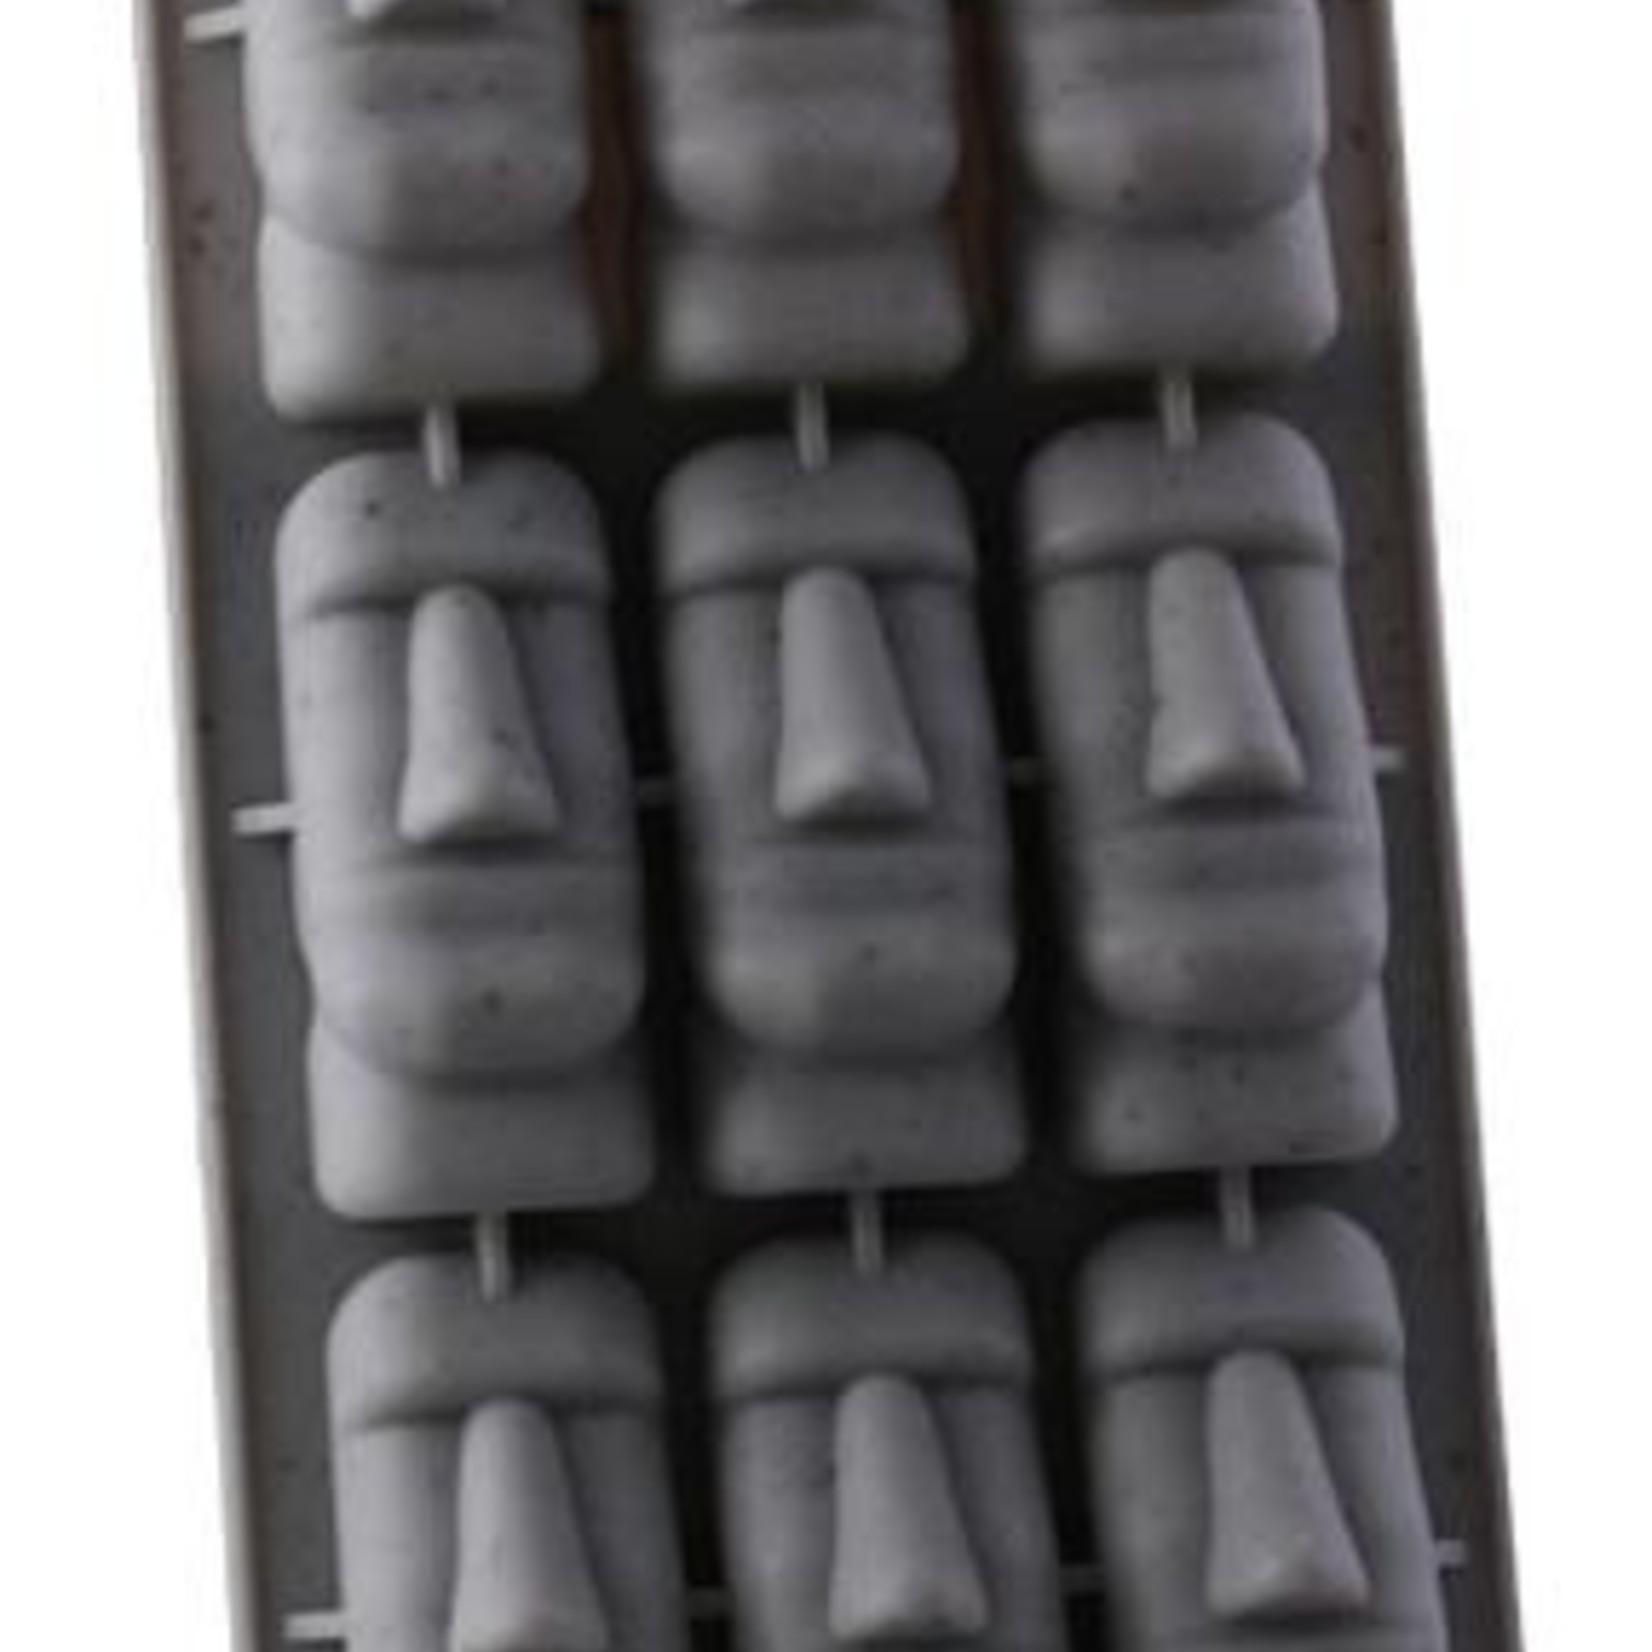 Easter Island Tiki Ice Mold Tray